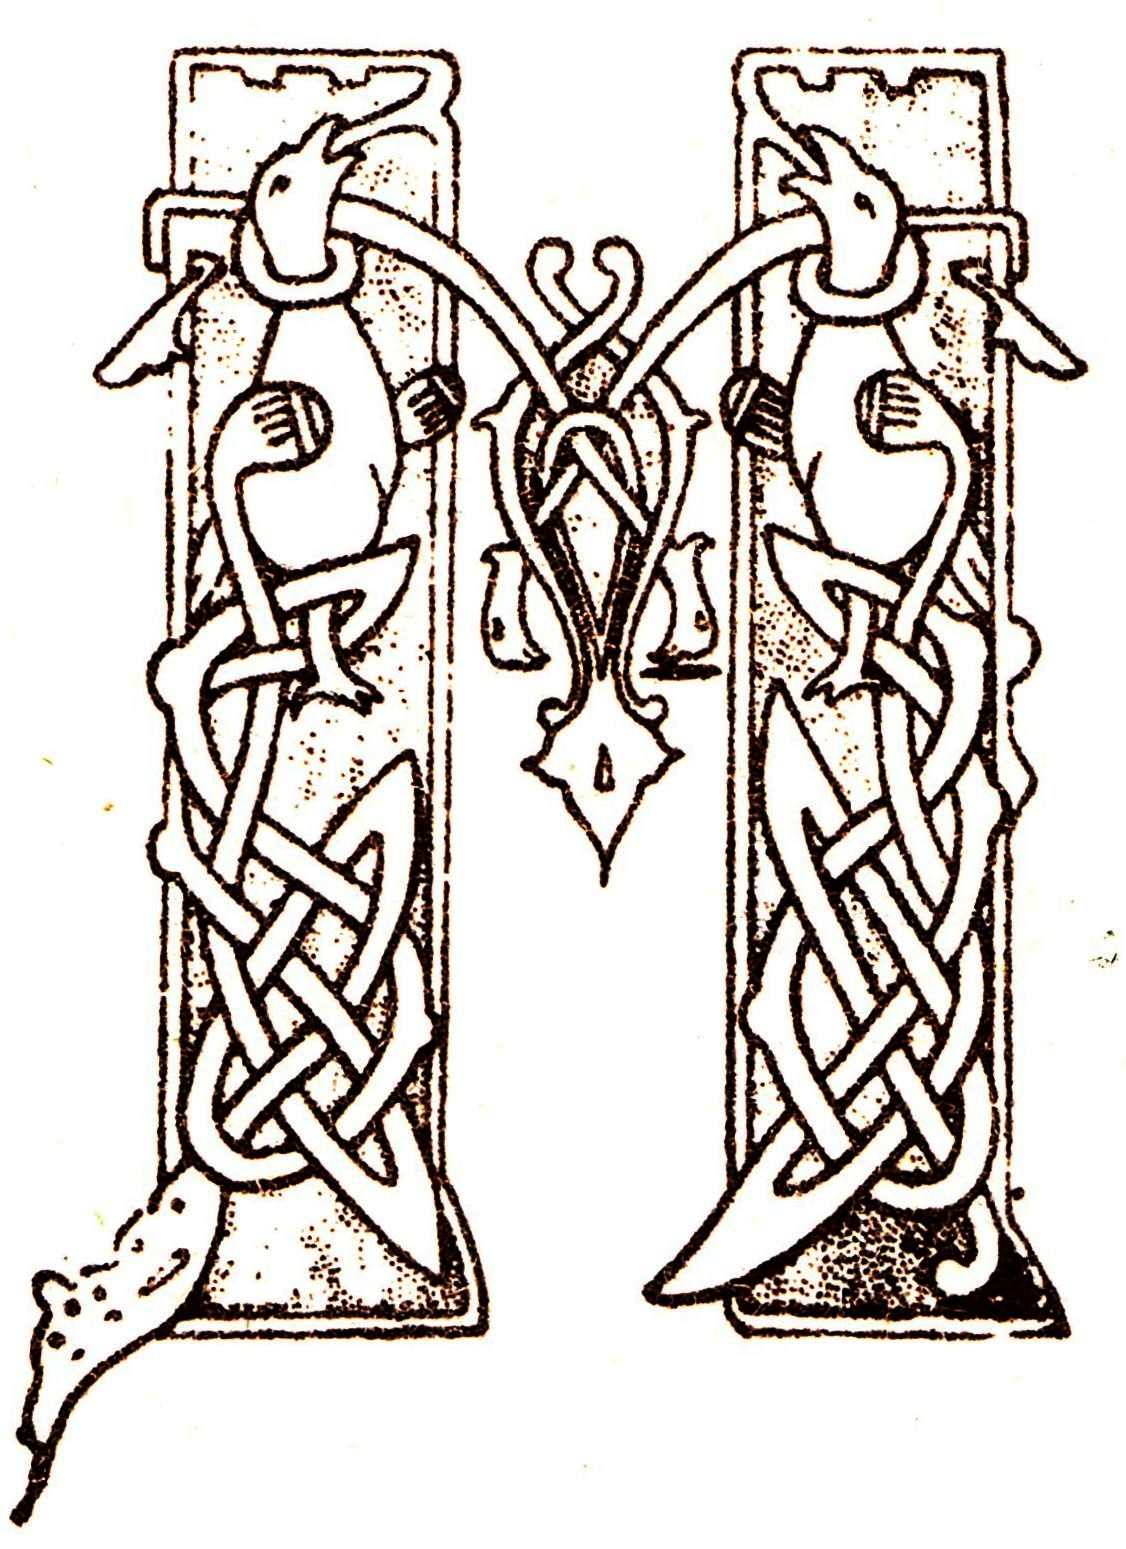 Файл:Три века Буква М Сытин 1912.jpg — Википедия